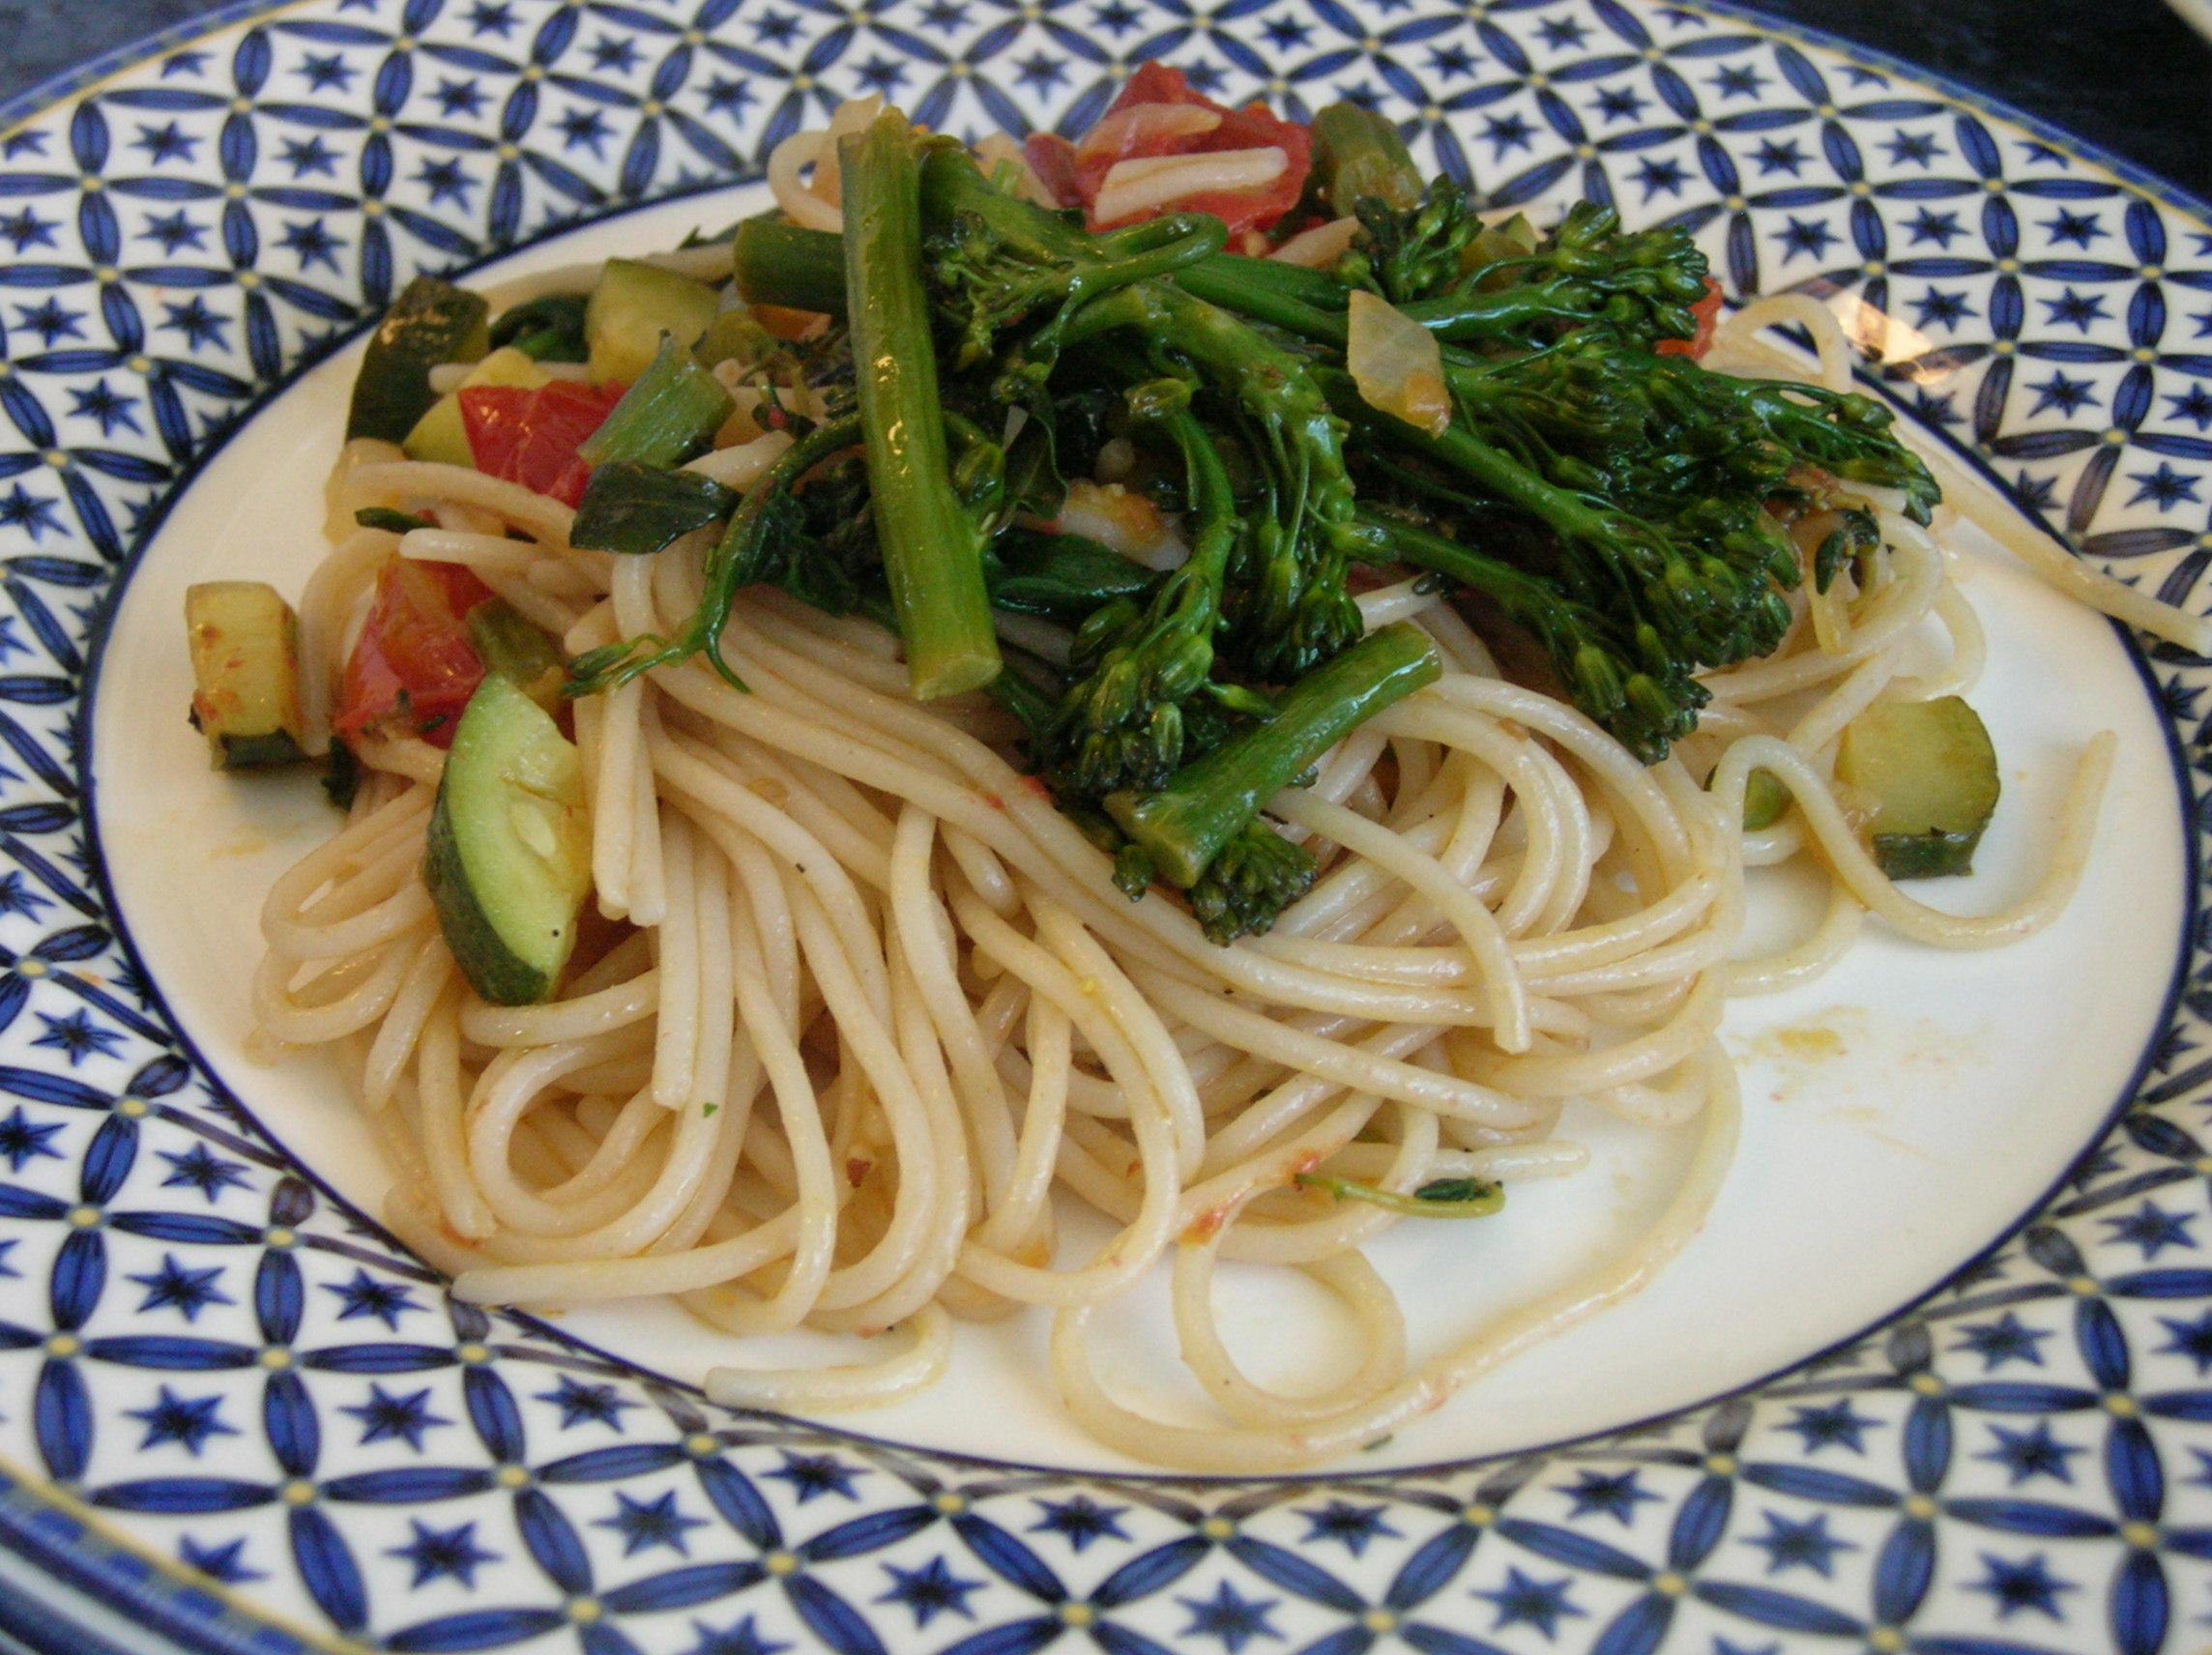 Mediterranean-style Rice Pasta